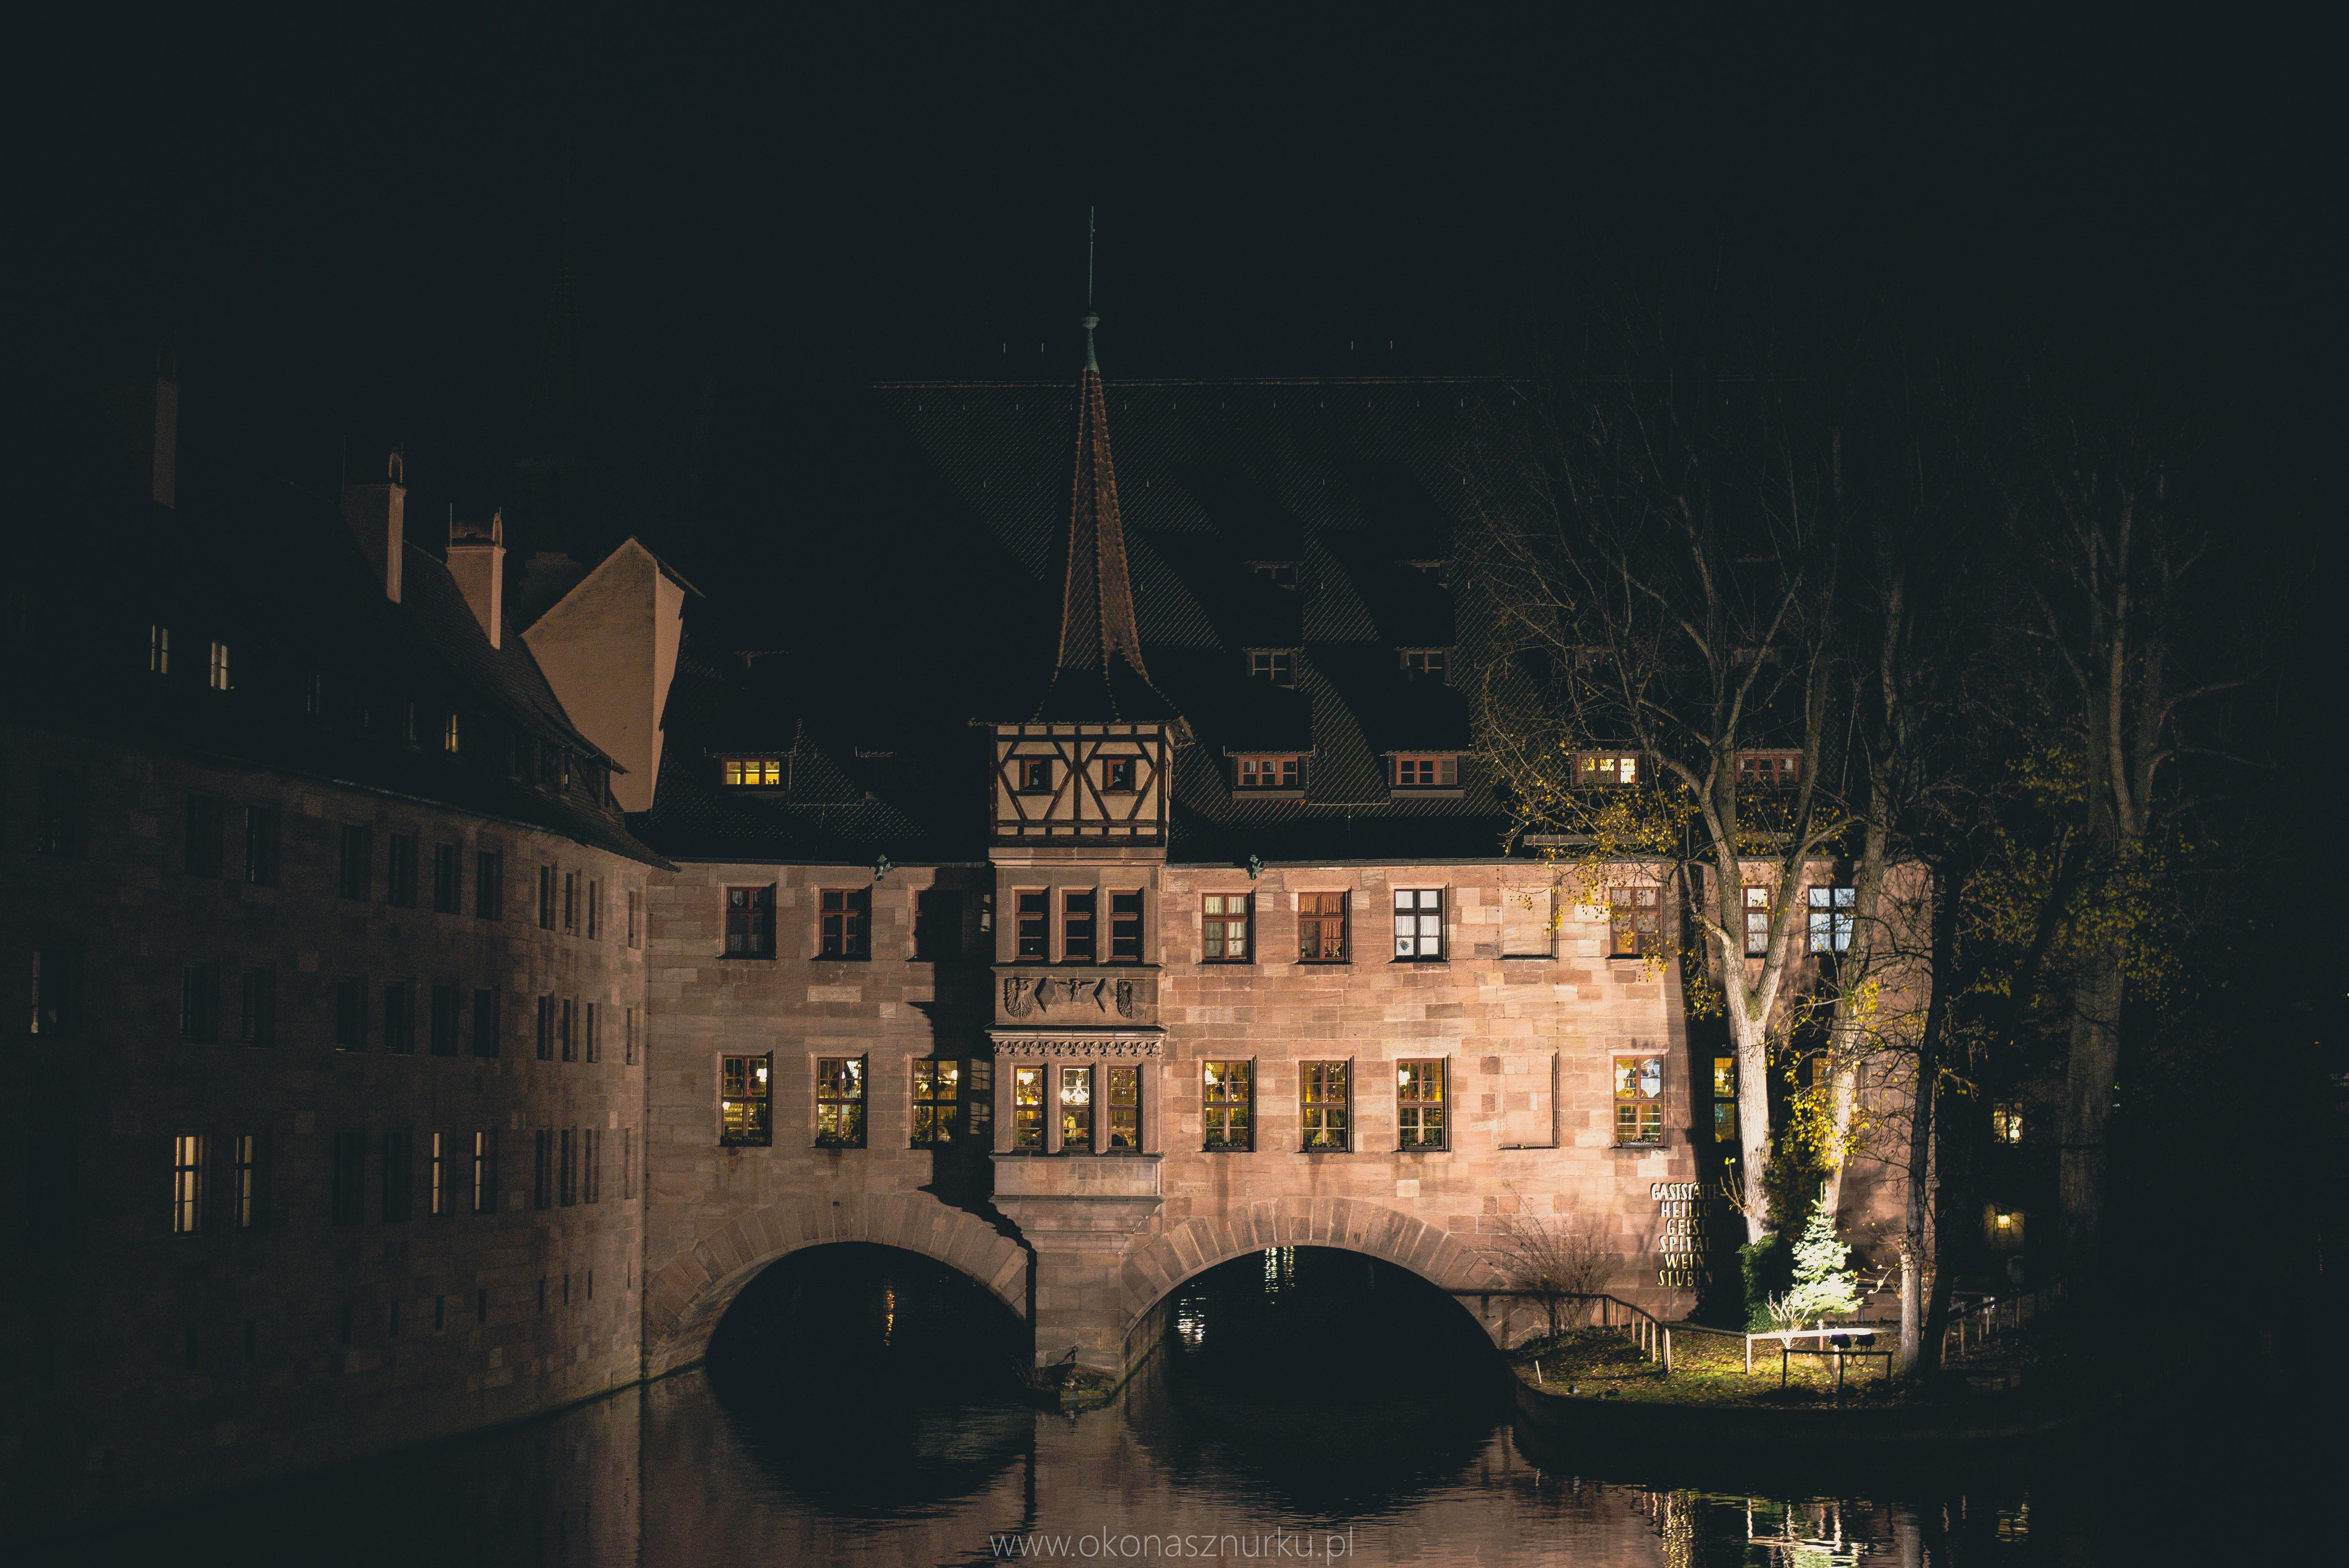 Nürnberg-stadt-norymberga-bayern-city-frankonia (34)